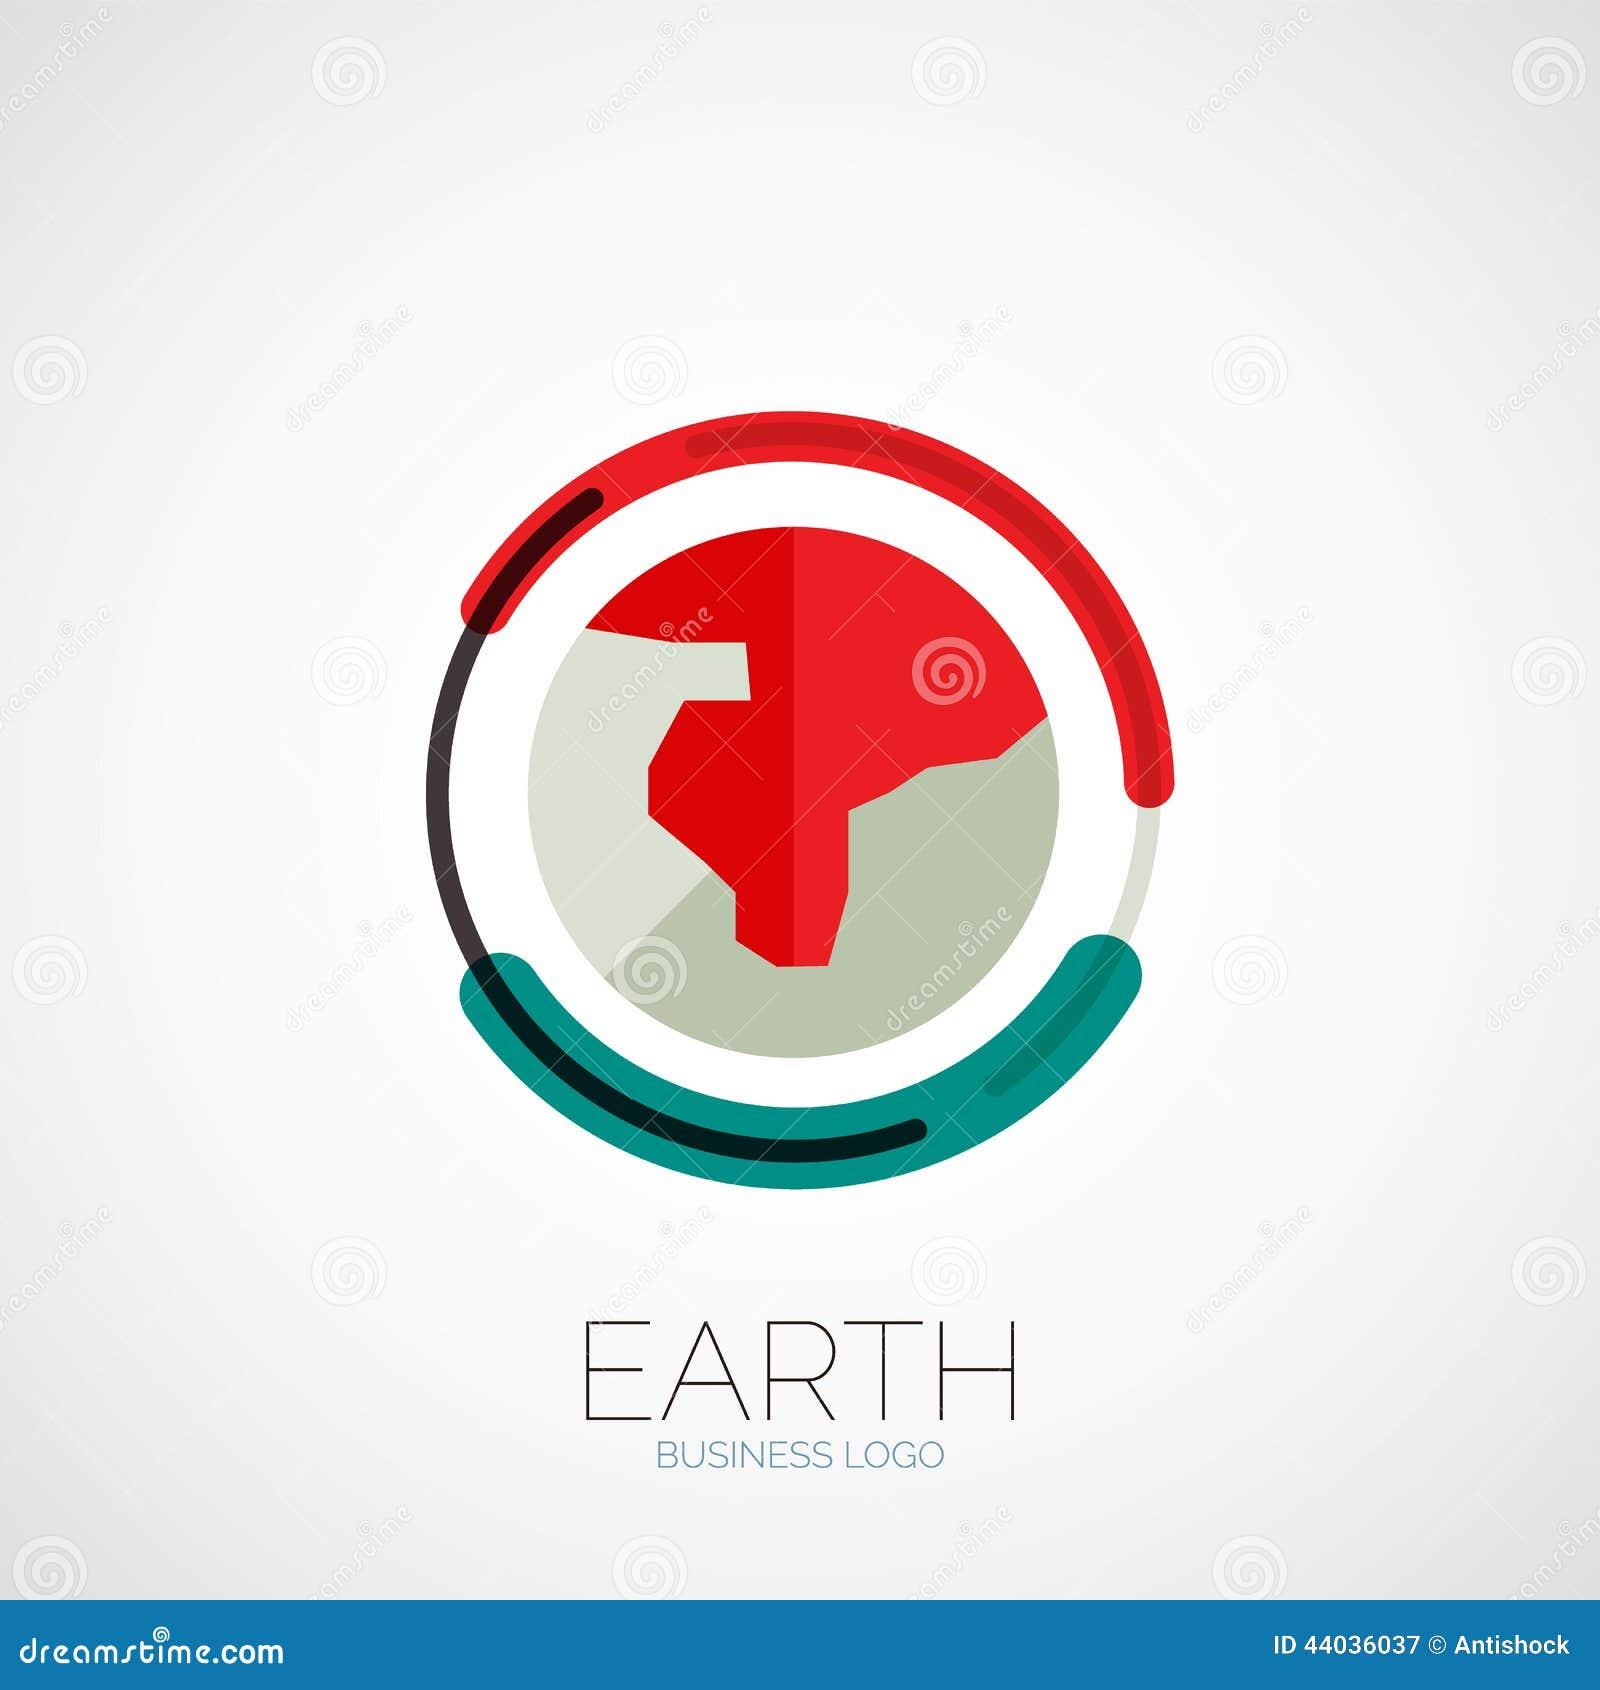 Earth company logo design stock vector image of modern 44036037 - Custom signs for home decor concept ...